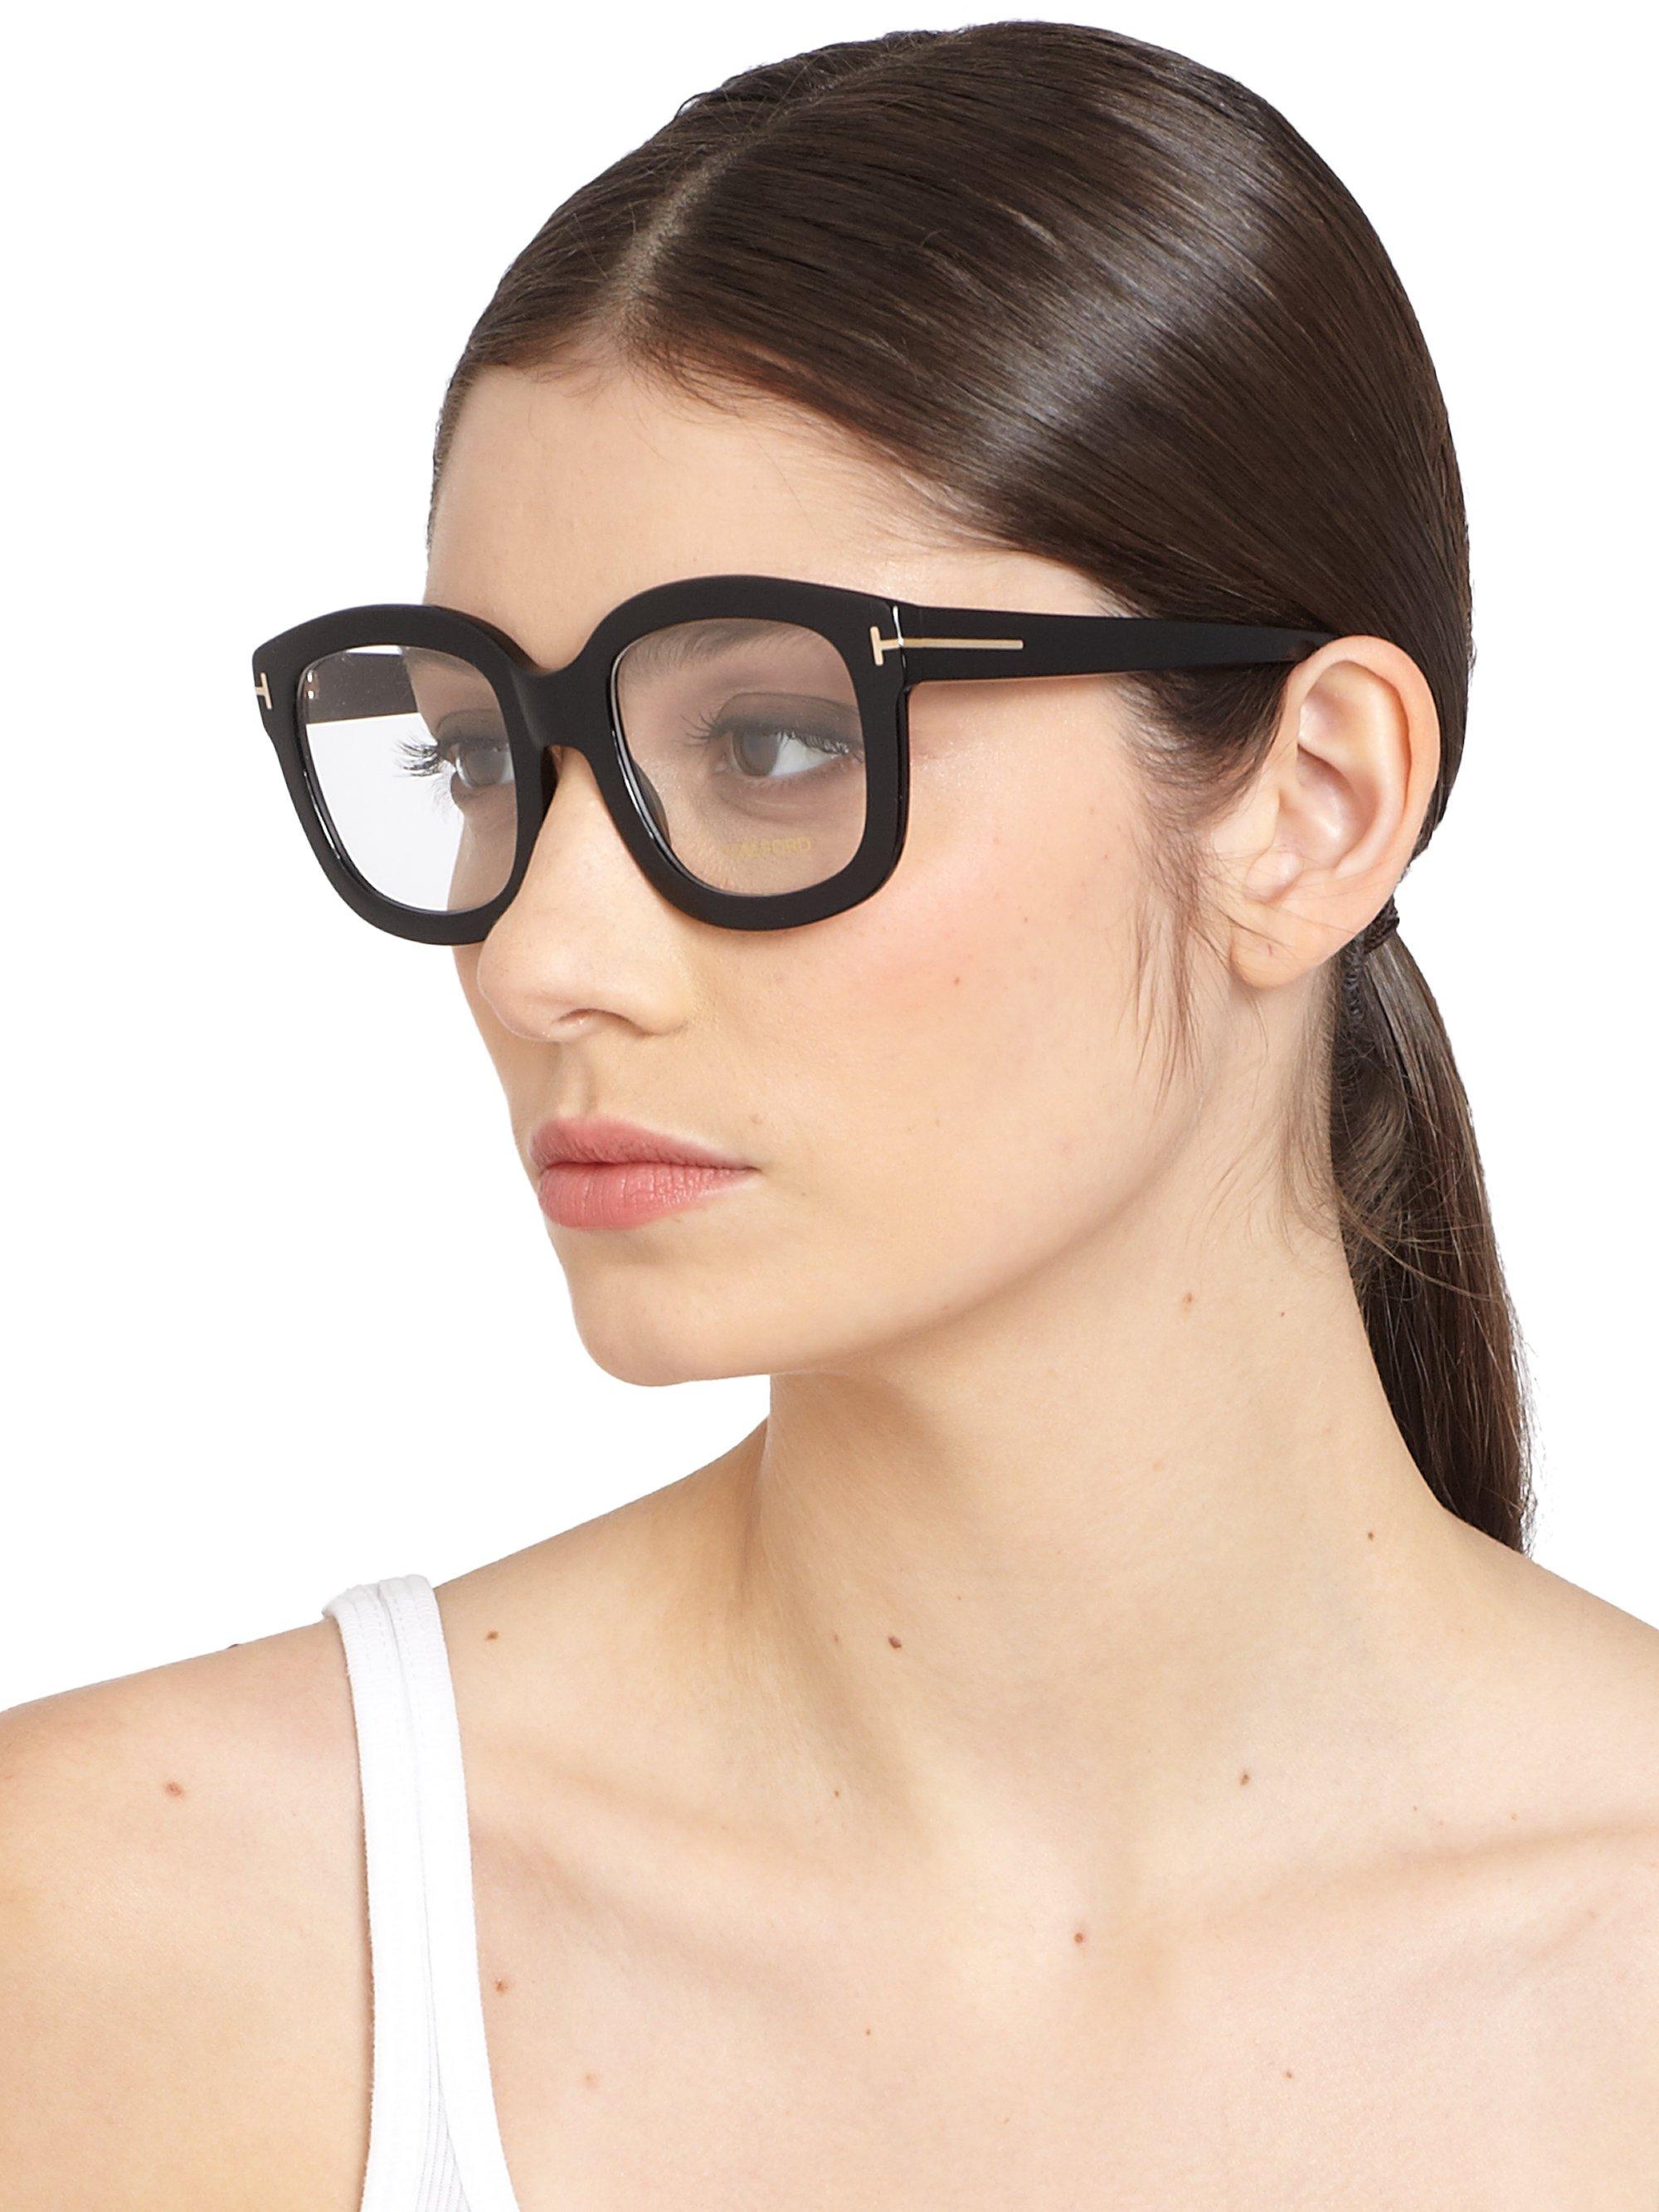 tom ford prescription glasses review